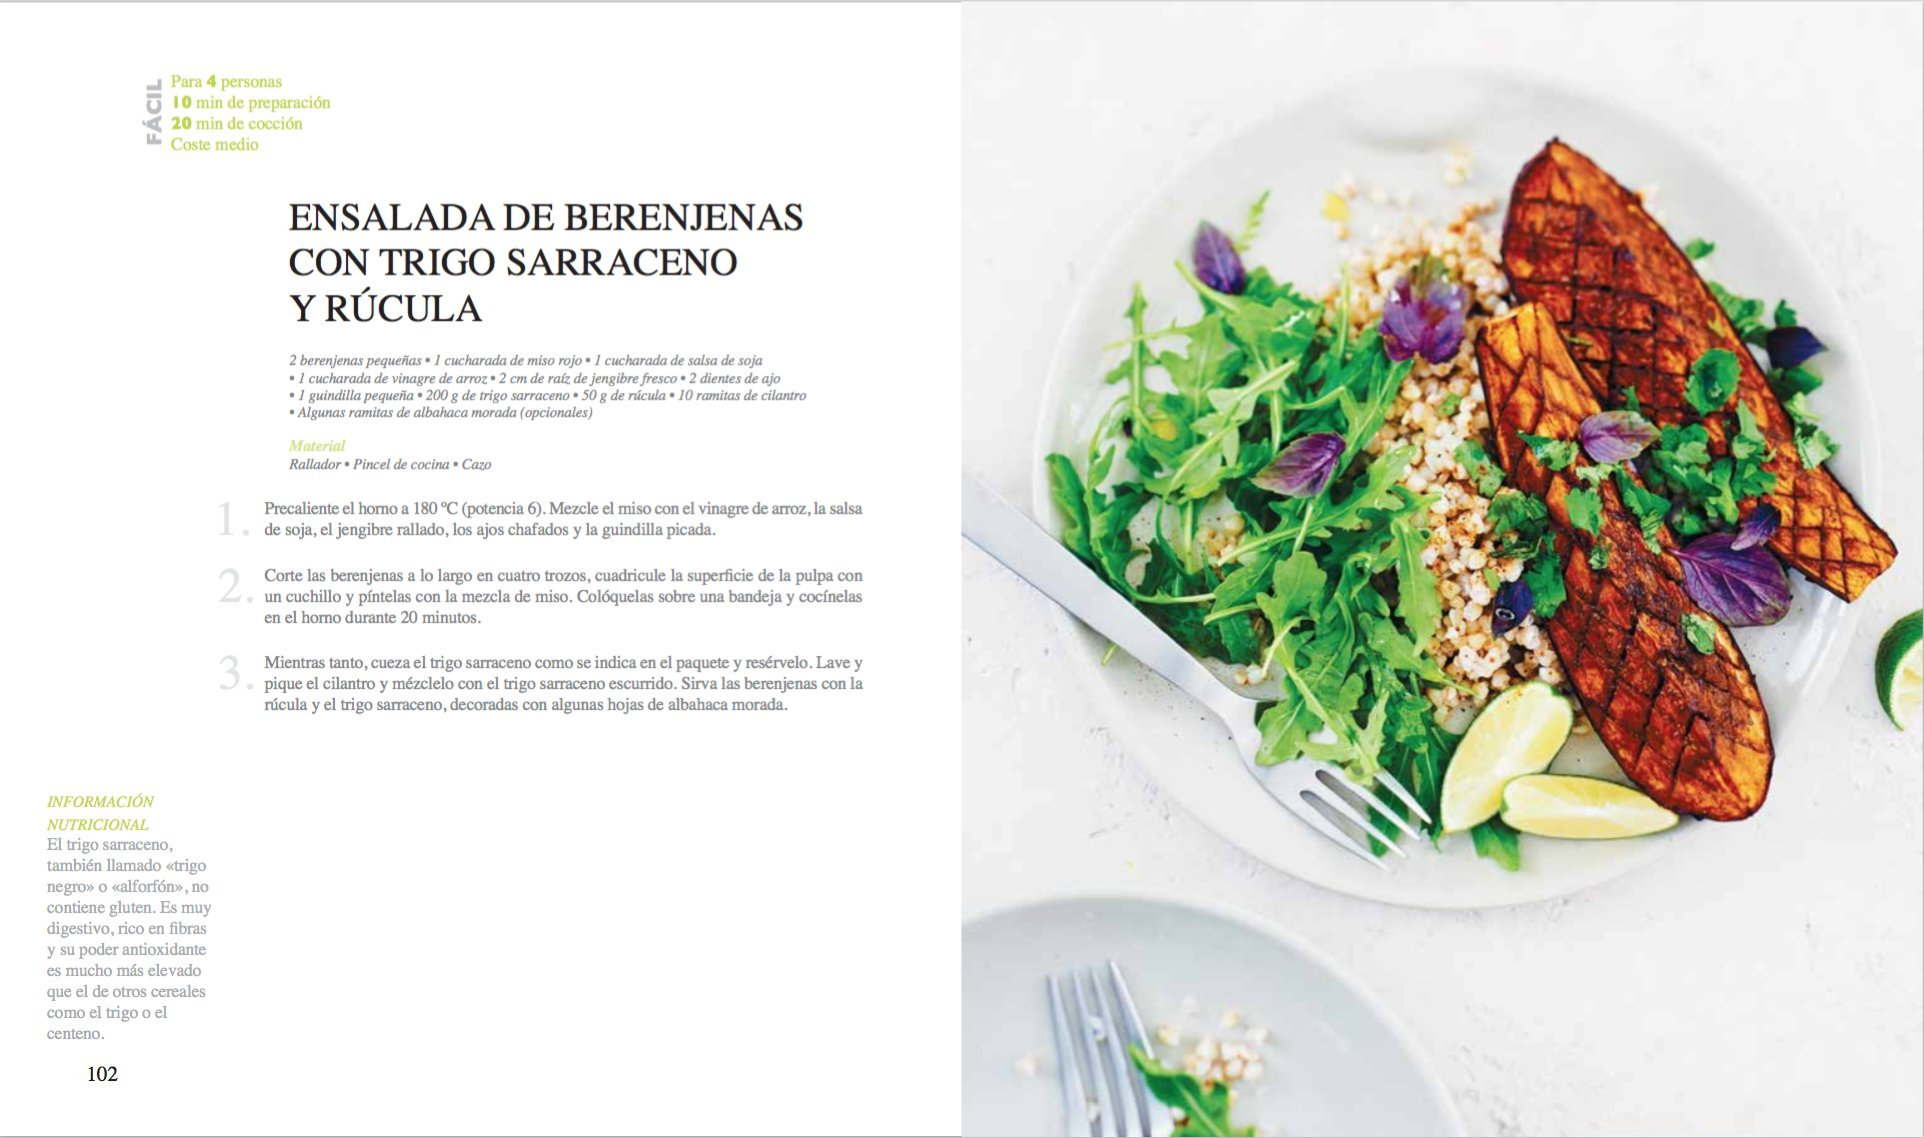 Detox: Recetas para depurar el organismo (Spanish Edition): Coralie Ferreira: 9788416407118: Amazon.com: Books